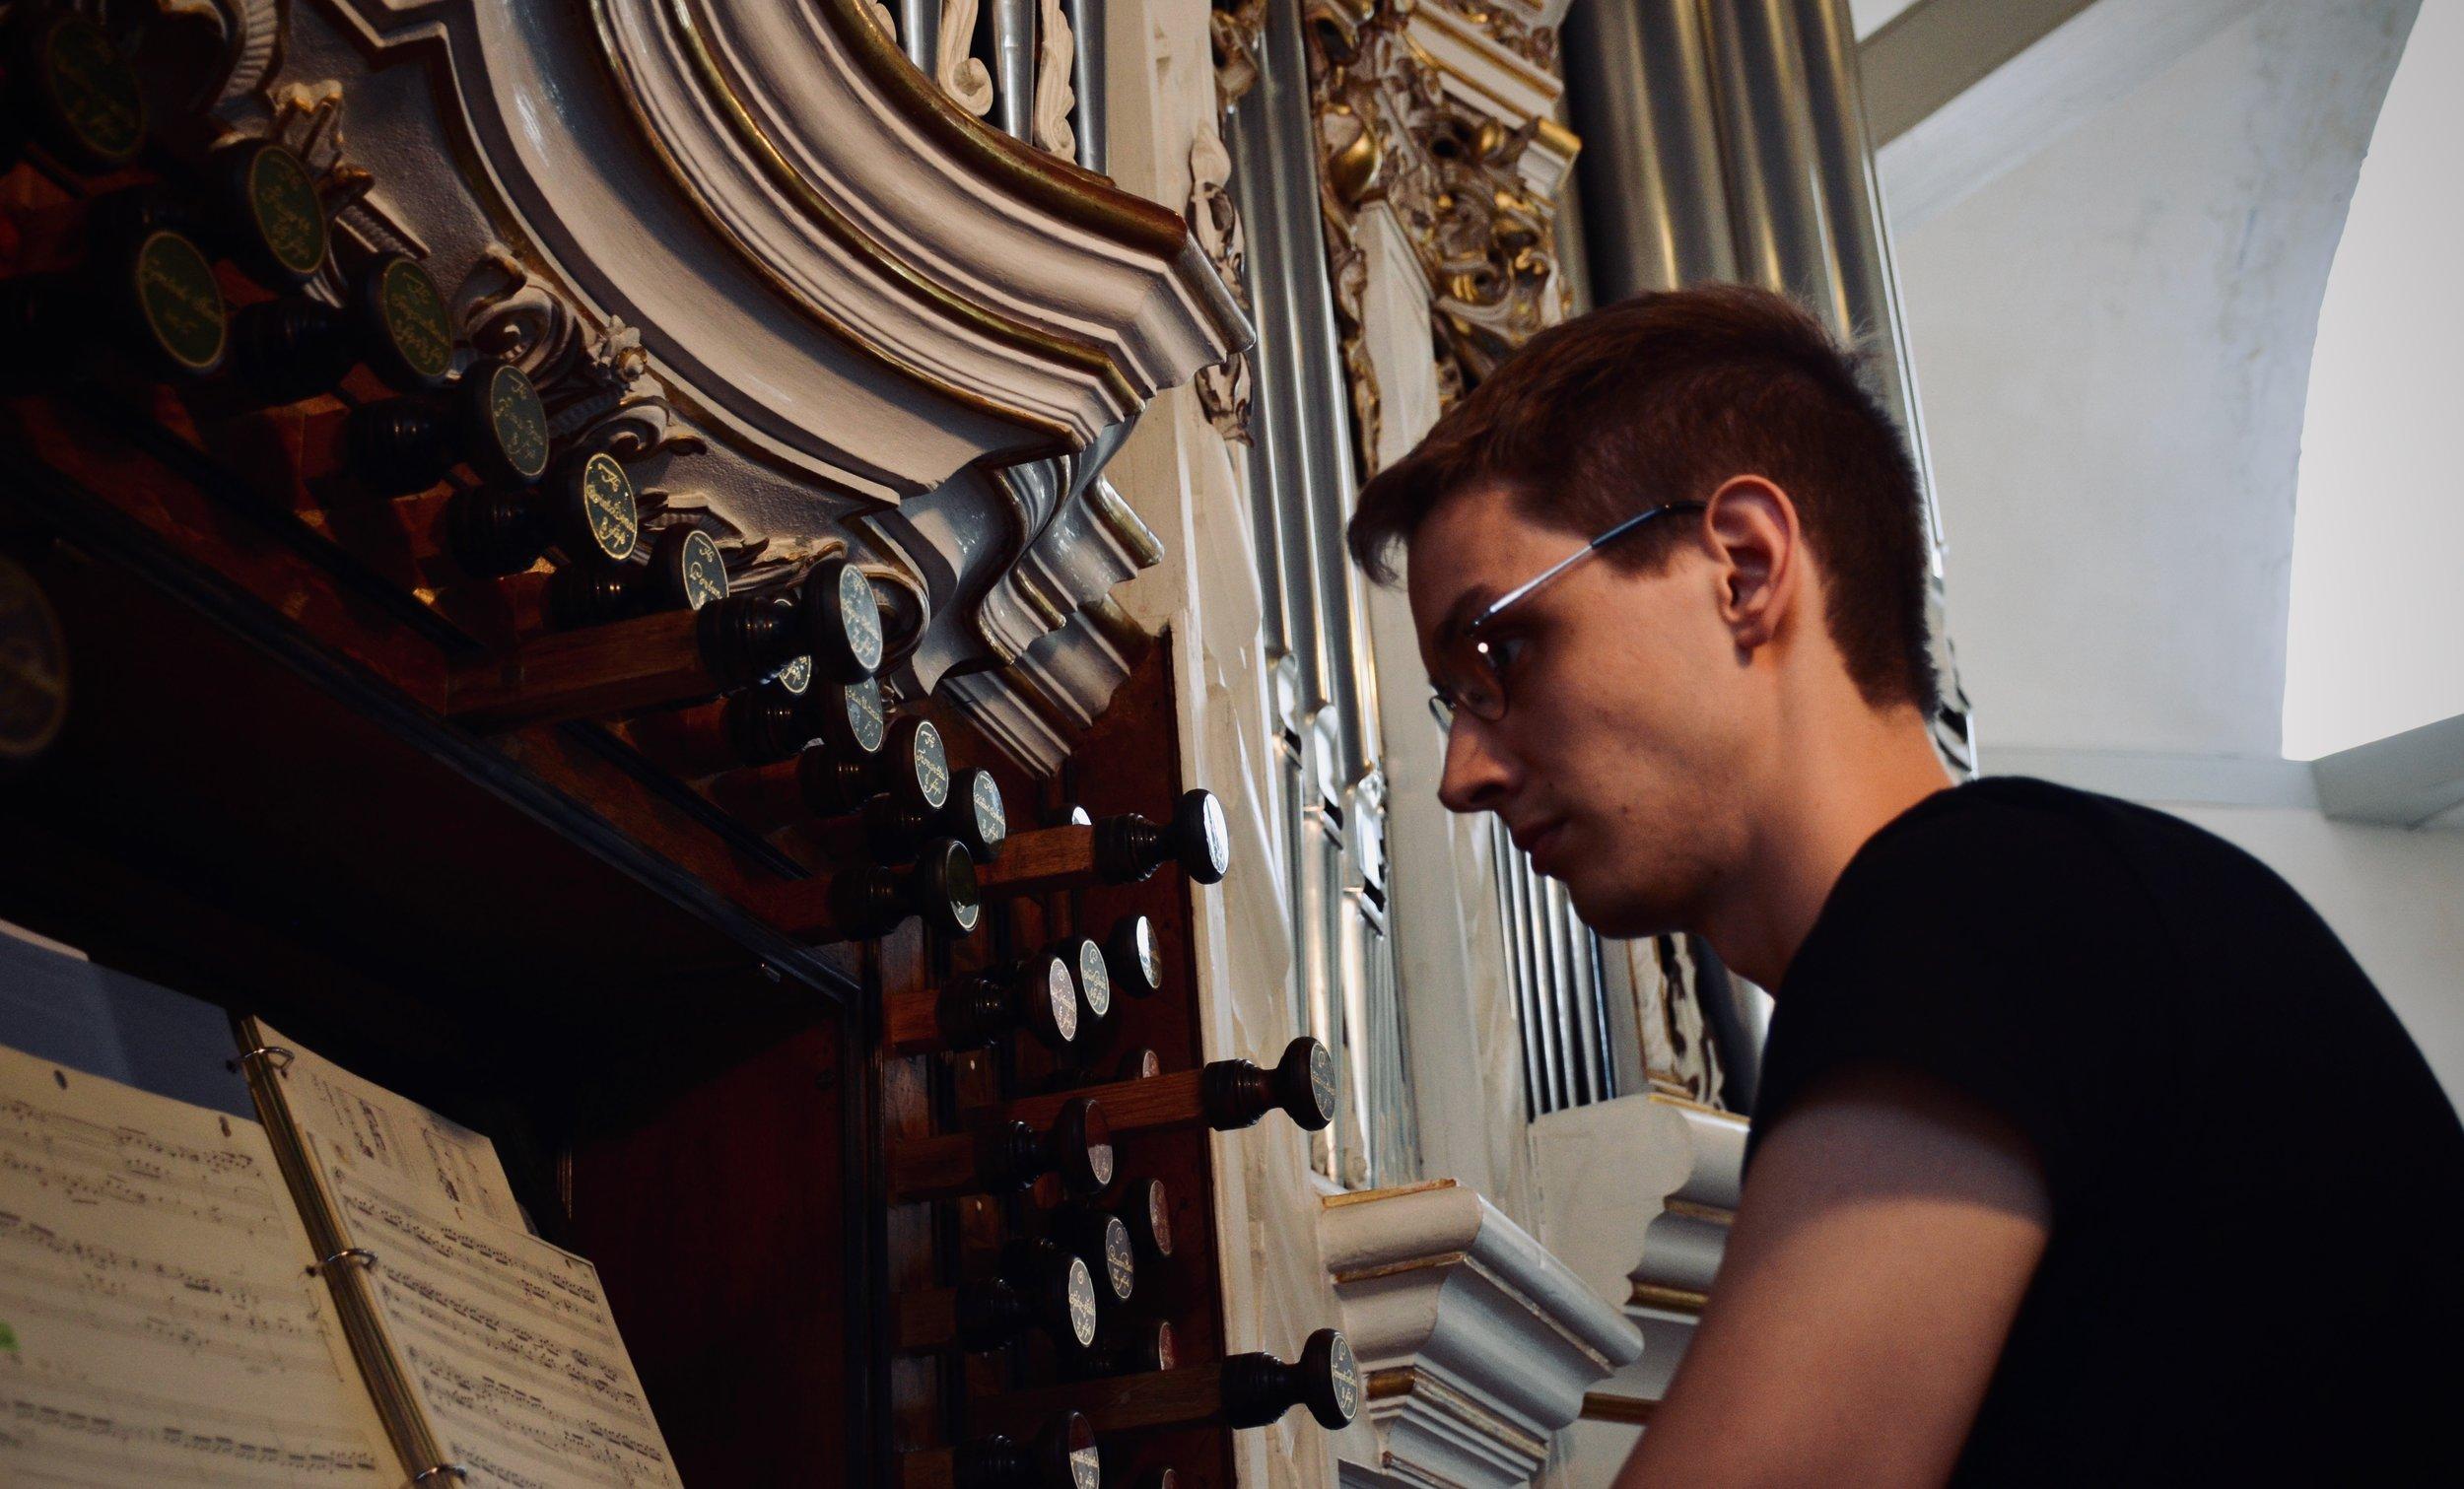 Alex Ross plays the 1730 Trost Organ, Stadtkirche, Waltershausen.